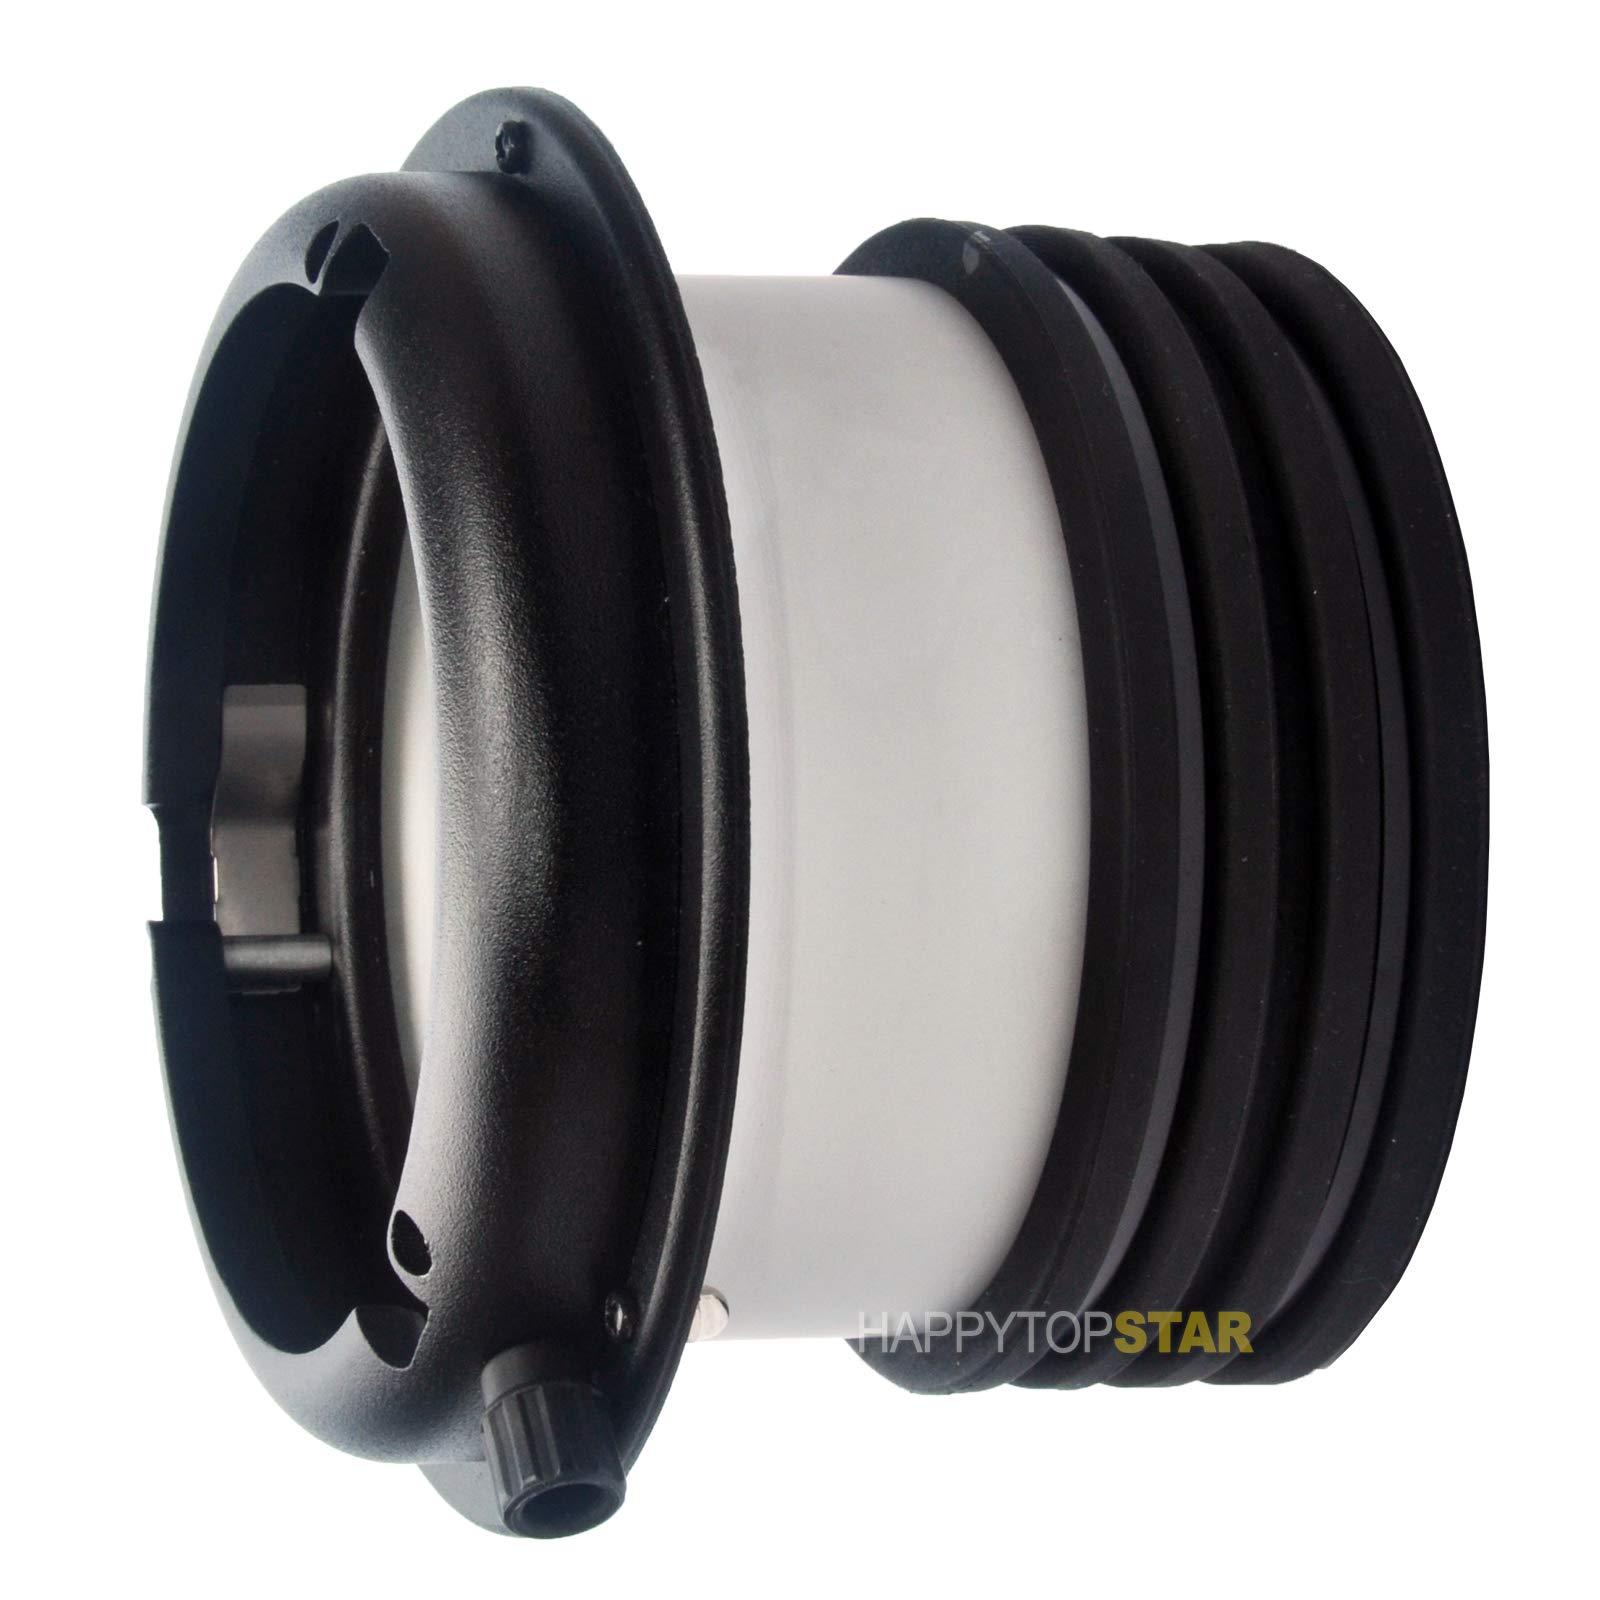 Profoto to Bowens Mount Bowen Mounts Speedring Speeding Adapter Adaptor Converter for Studio Flash Strobe Light